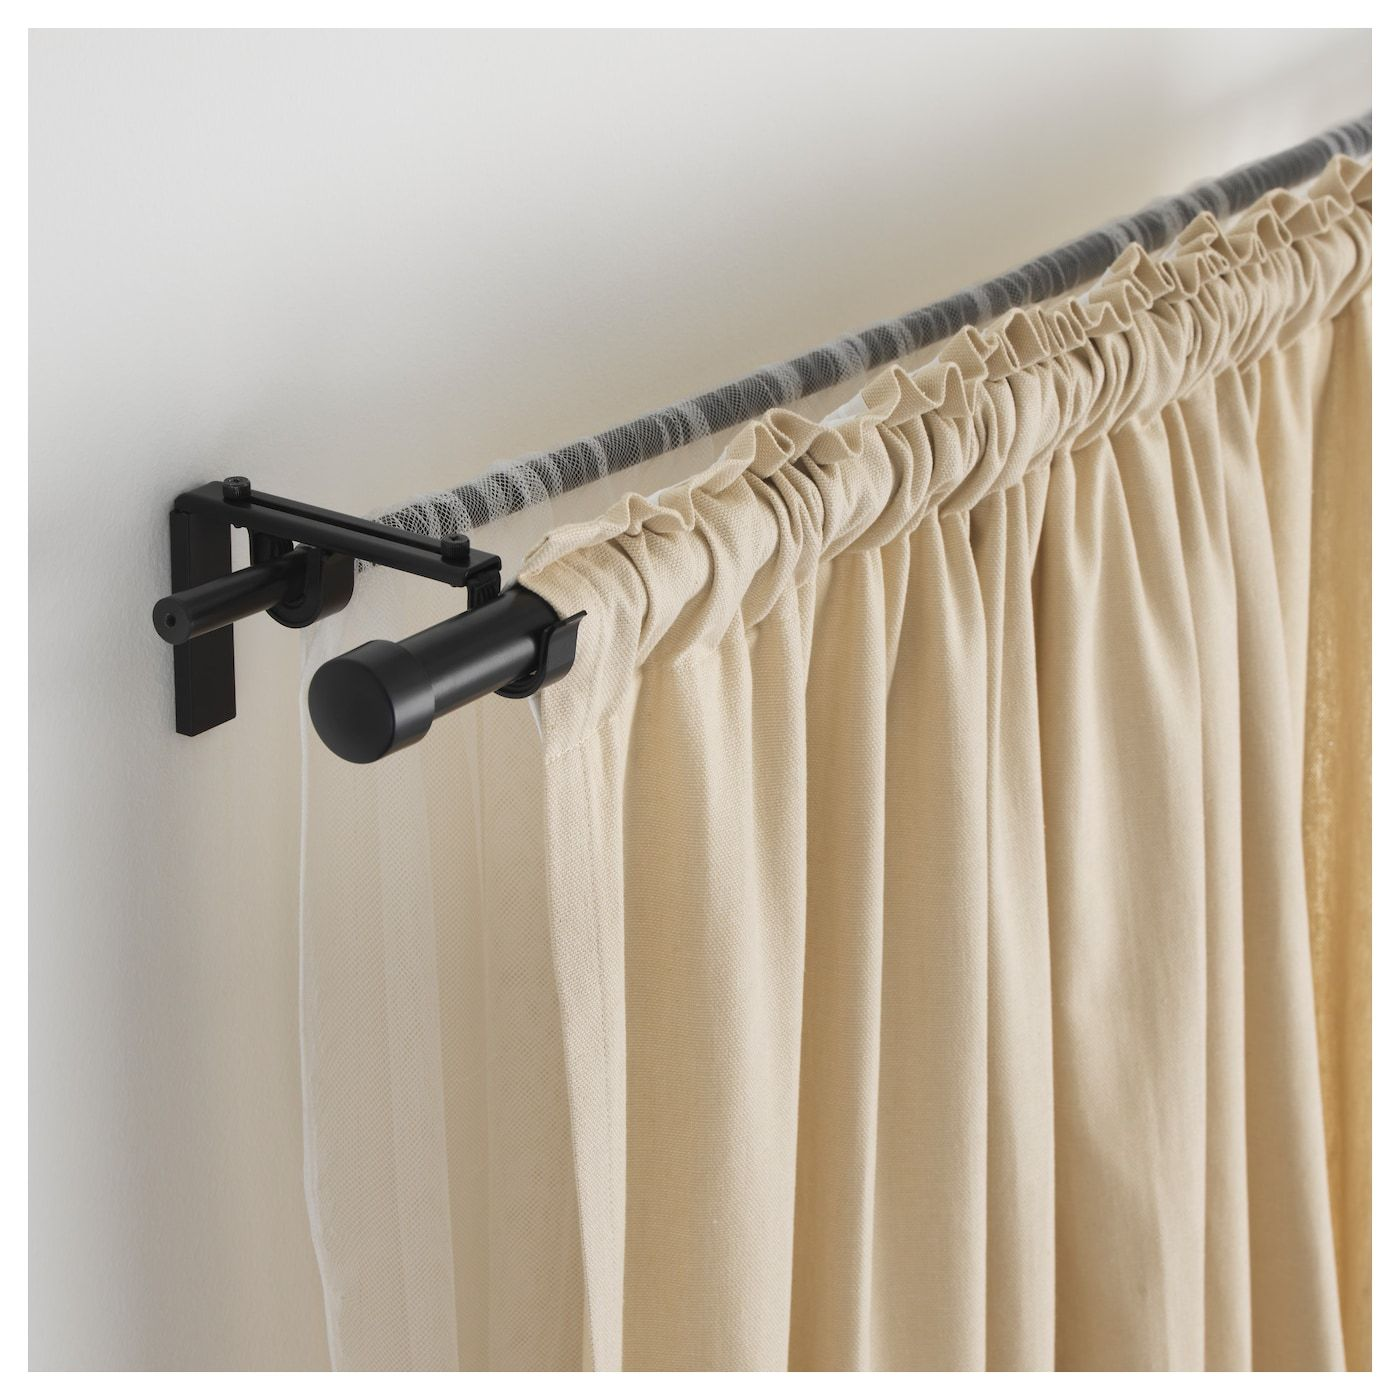 Racka Hugad Double Curtain Rod Combination Black 82 5 8 151 5